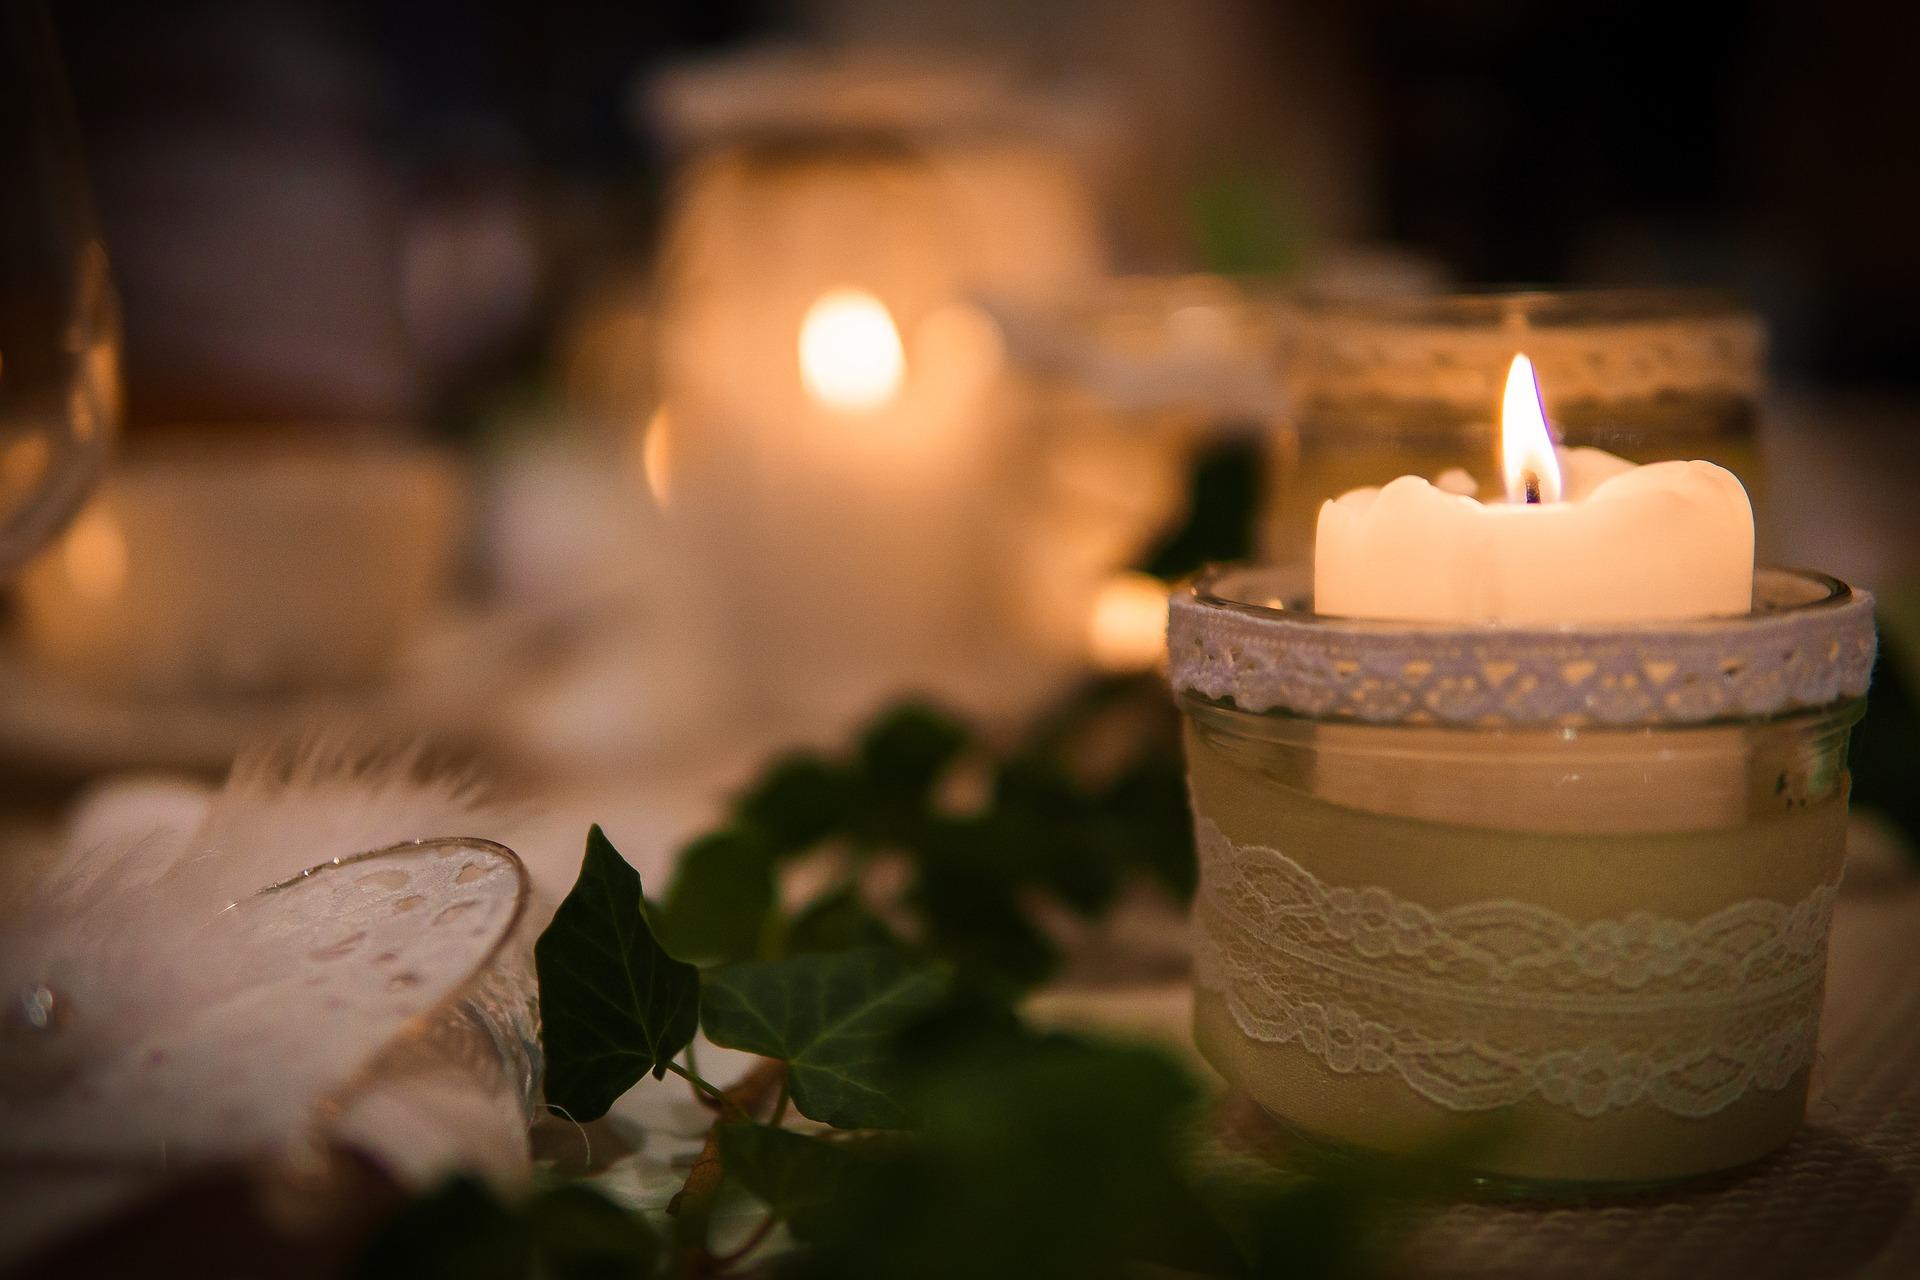 candlelight-2826332_1920.jpg